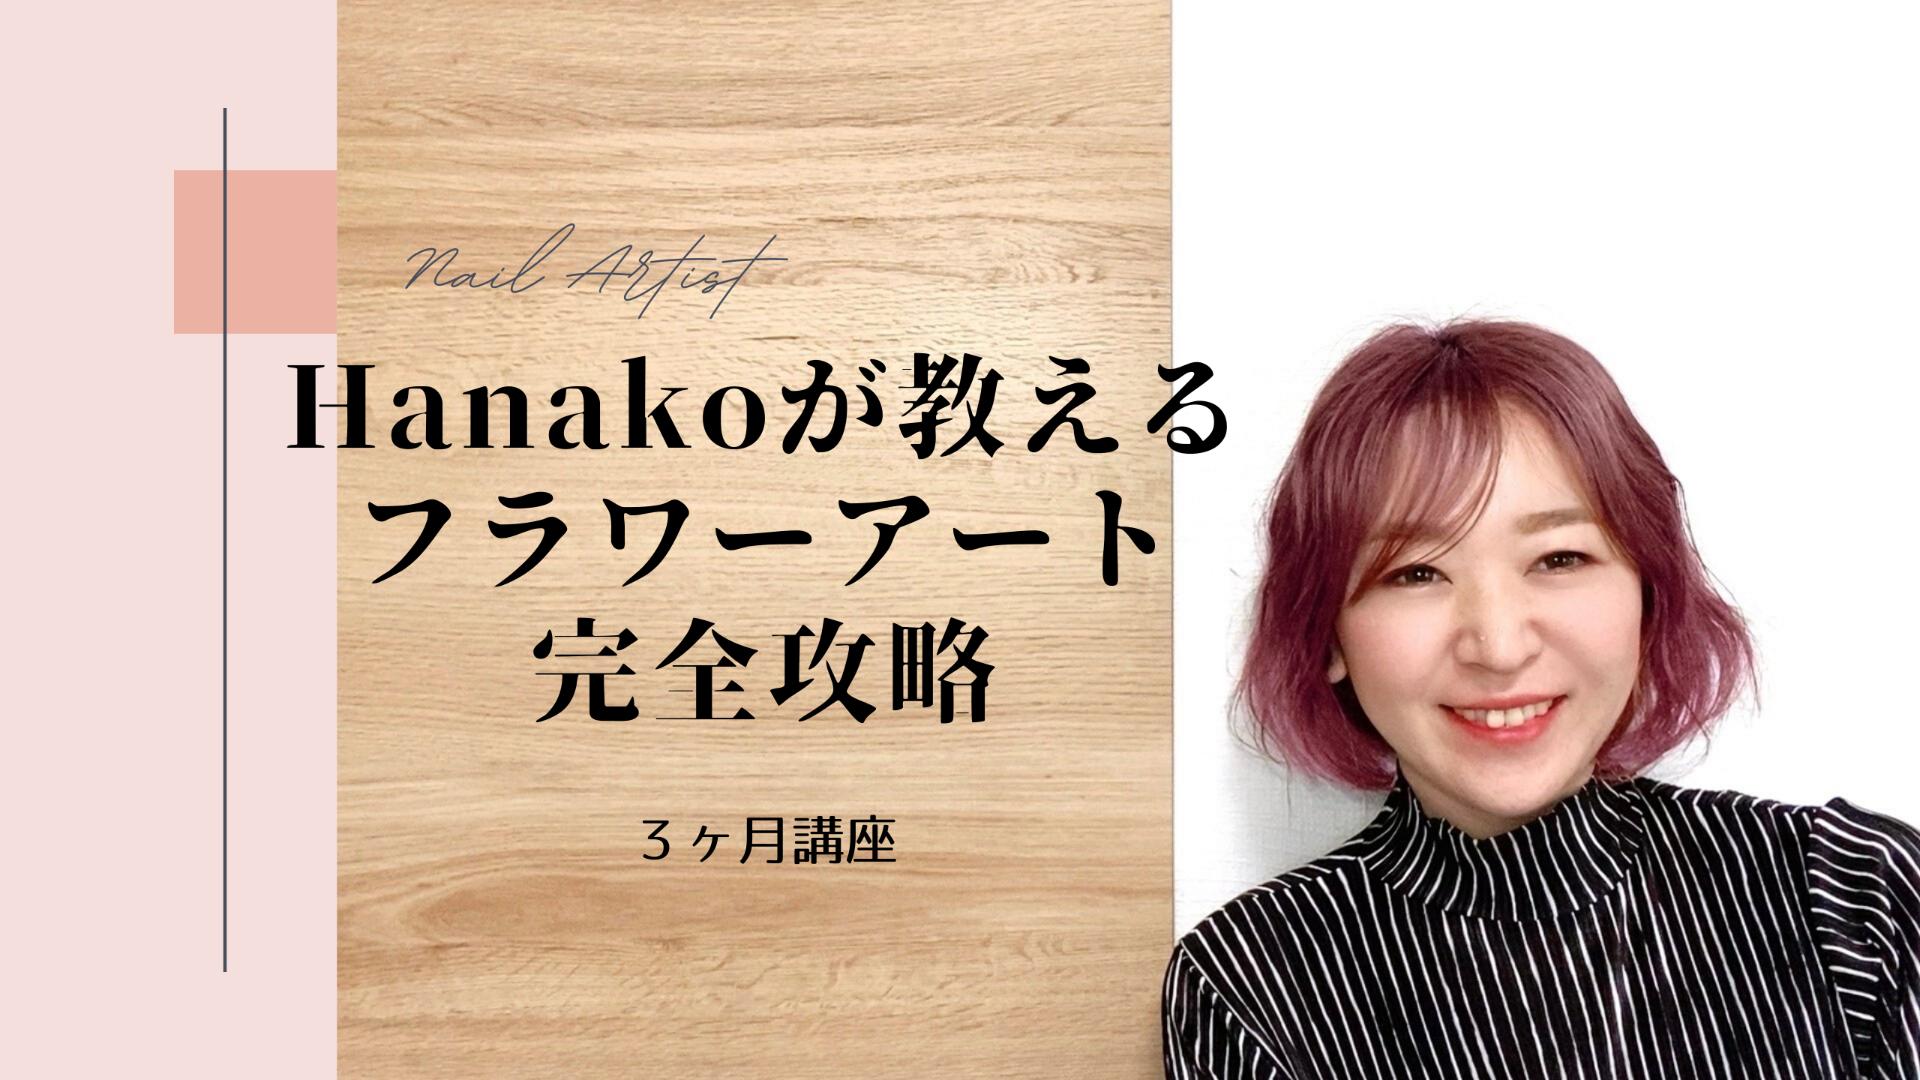 Hanakoが教えるフラワーアート完全攻略!3ヶ月講座